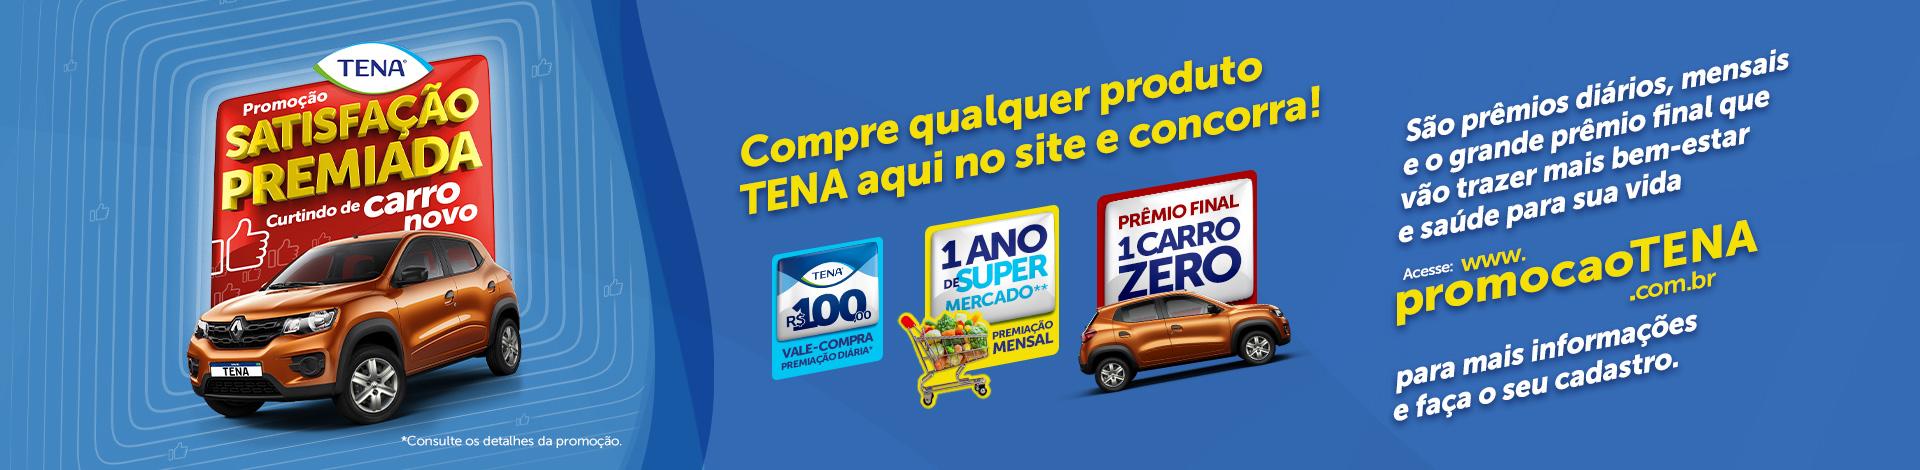 bn-slide-promocao-tena-saga